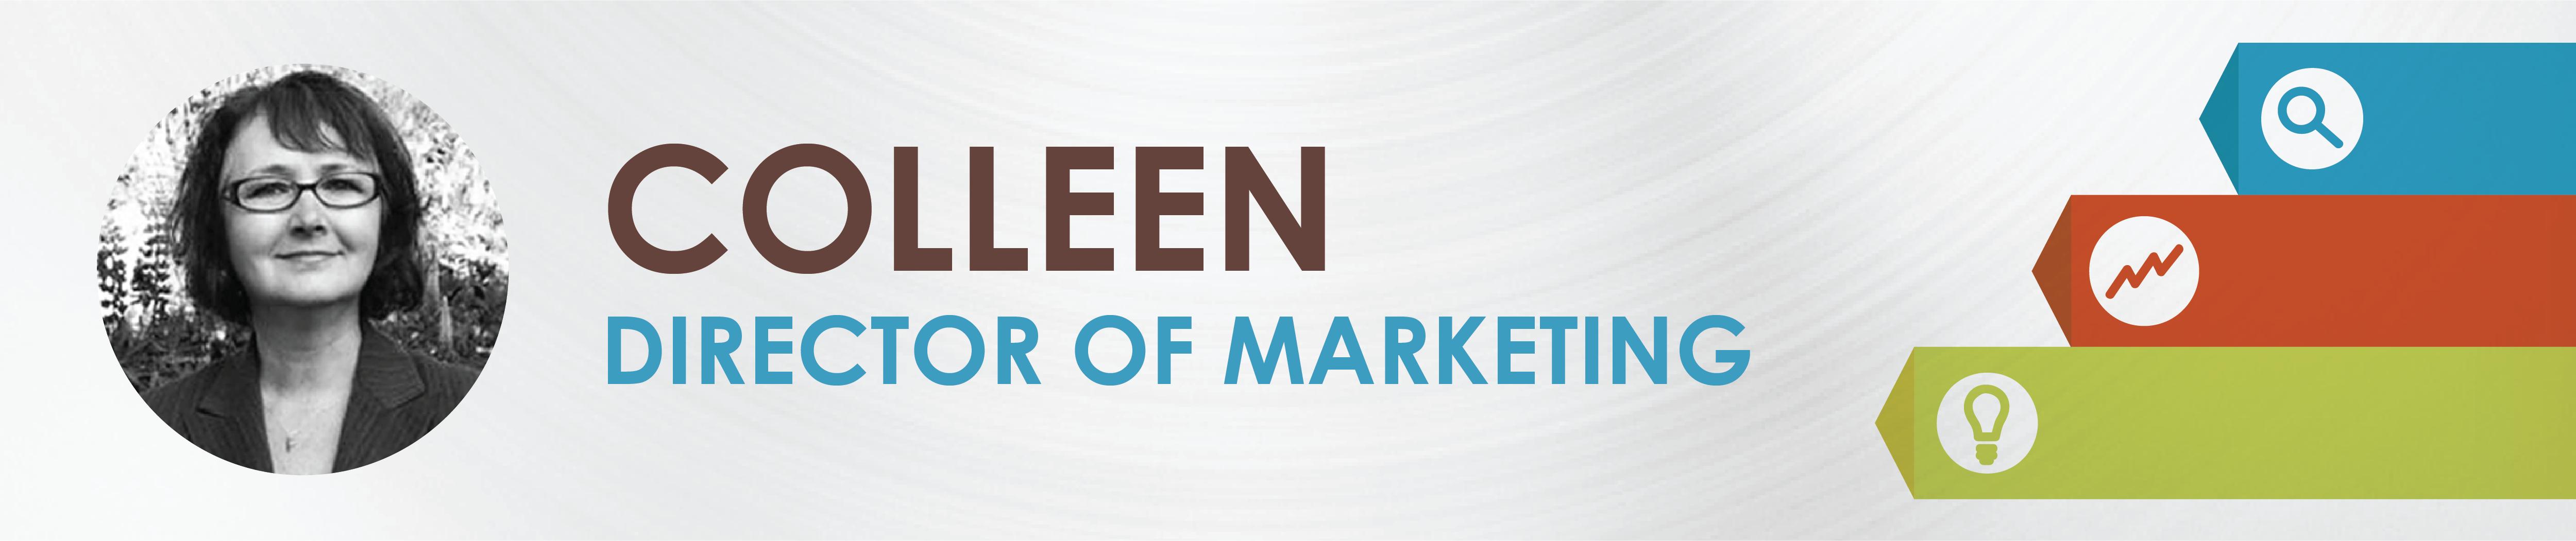 Colleen Blog Banner